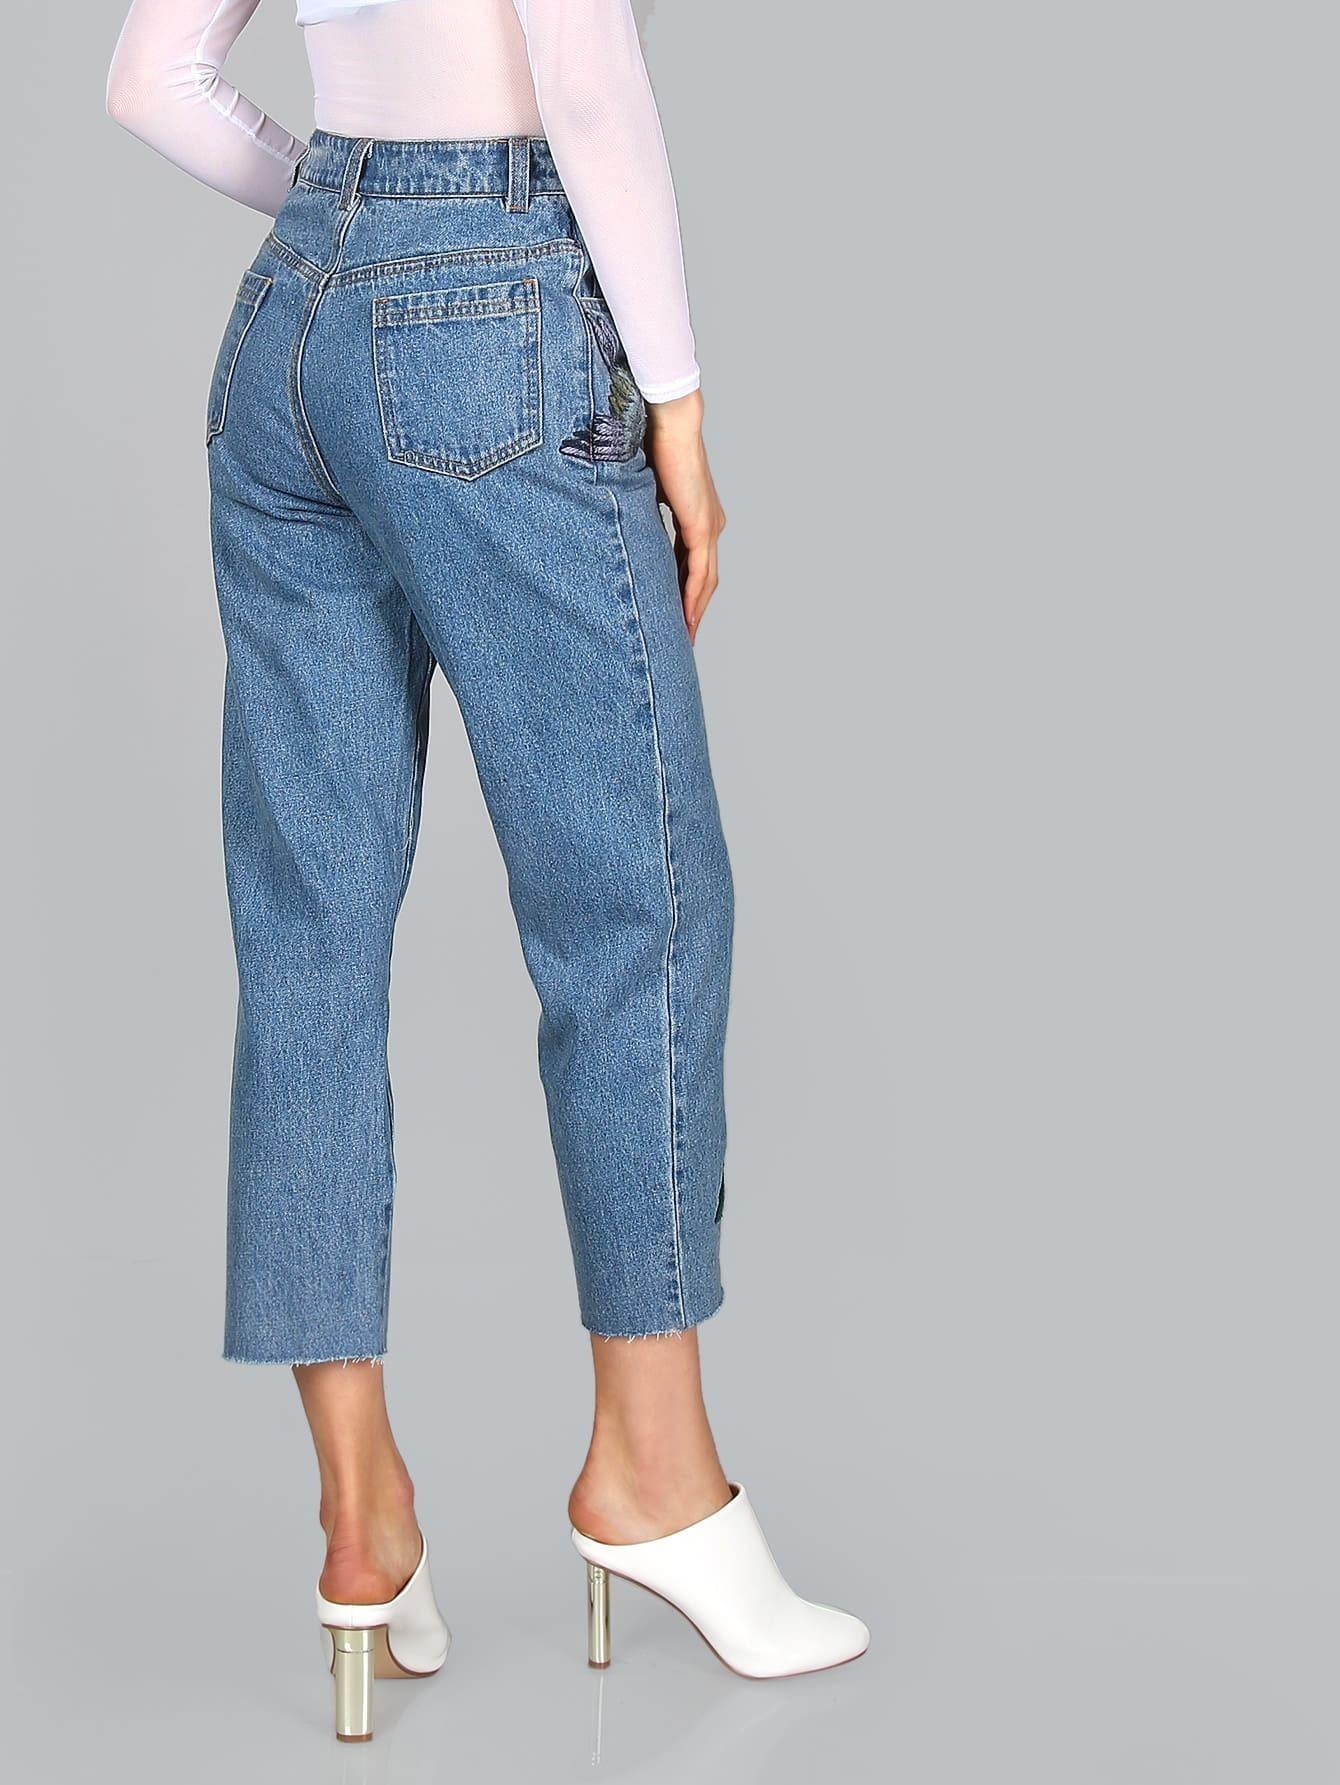 Cropped embroidered jeans denim shein sheinside